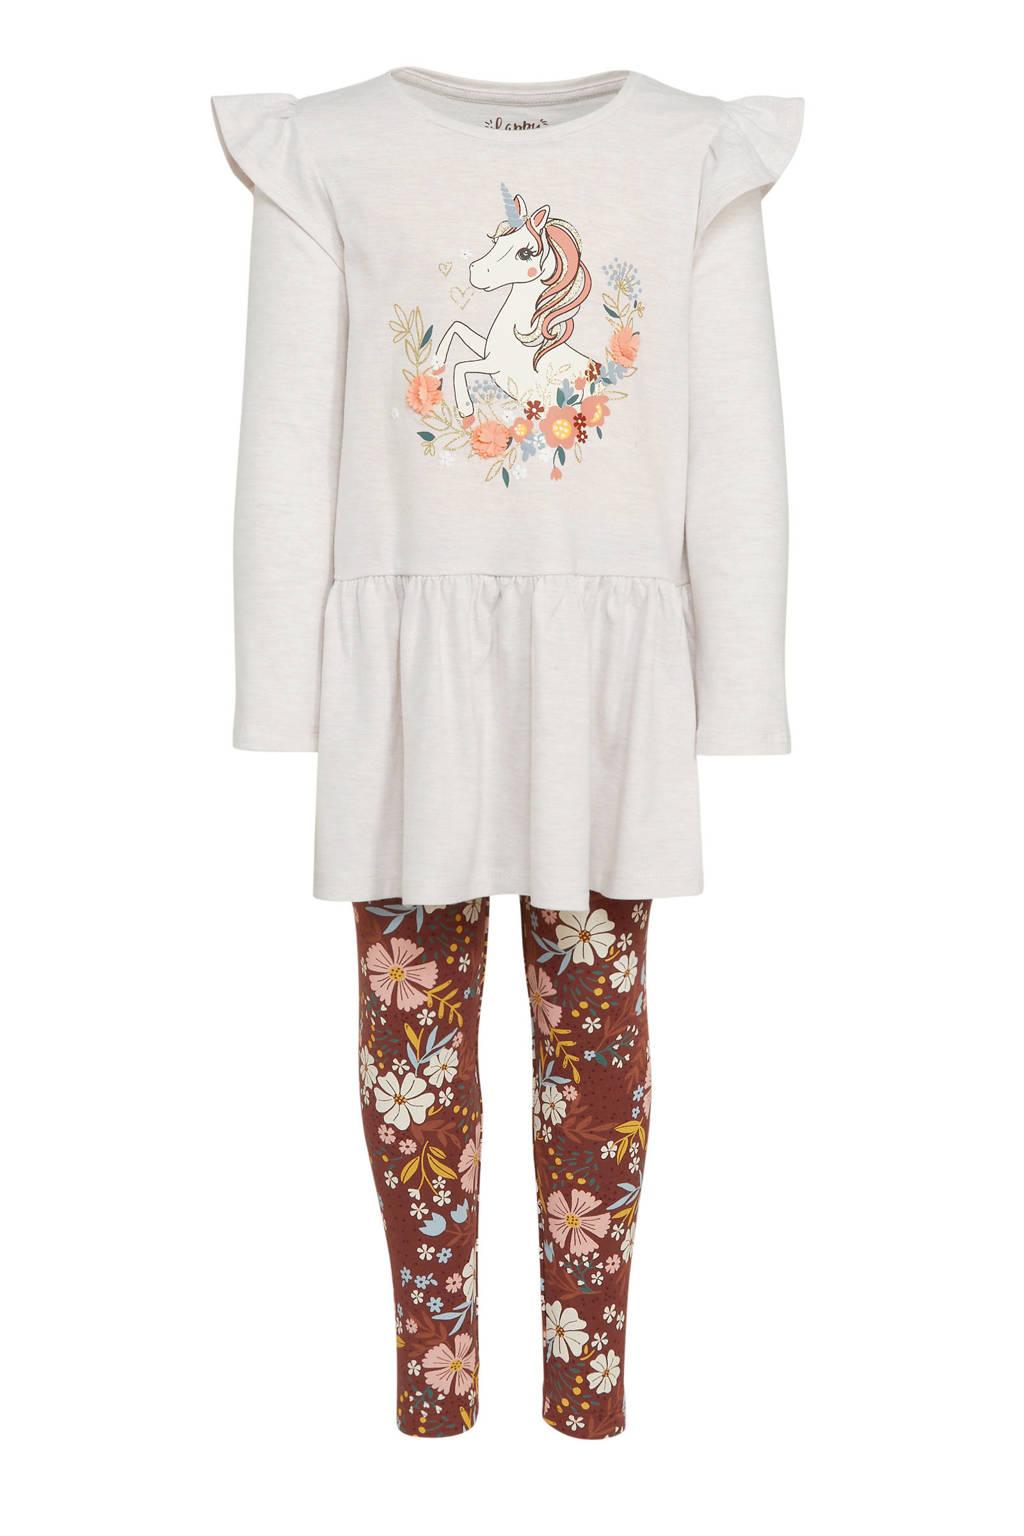 C&A Happy girls Club jurk + legging met bloemen bruin/offwhite, Ecru/bruin